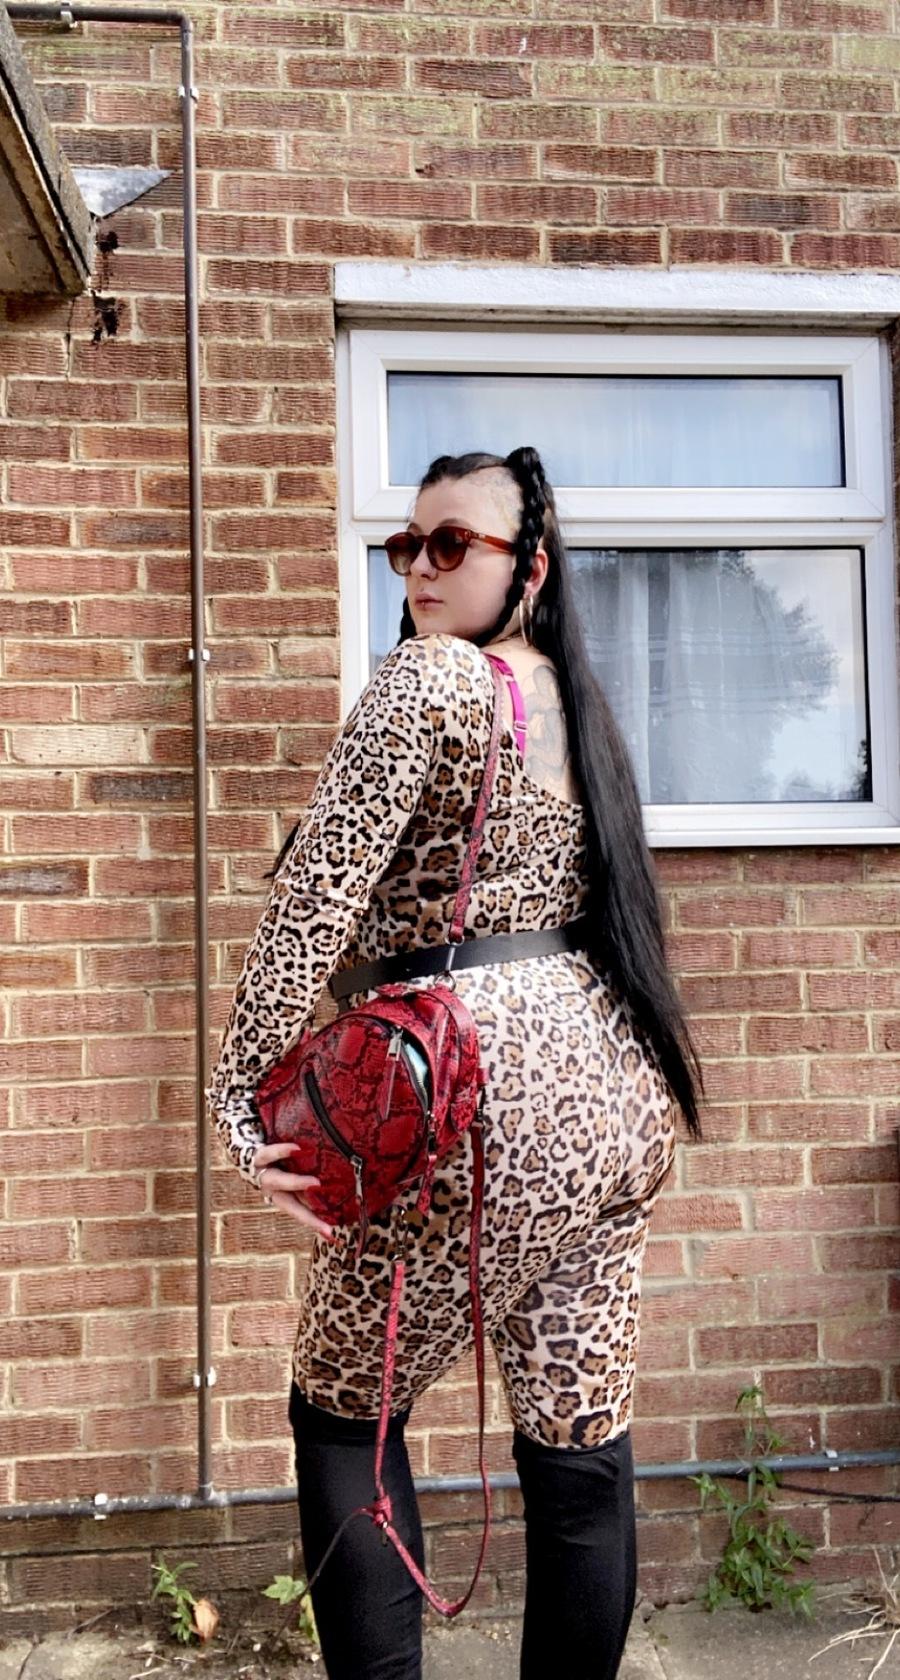 Model Brookes.hayden / Uploaded 29th August 2021 @ 08:32 AM